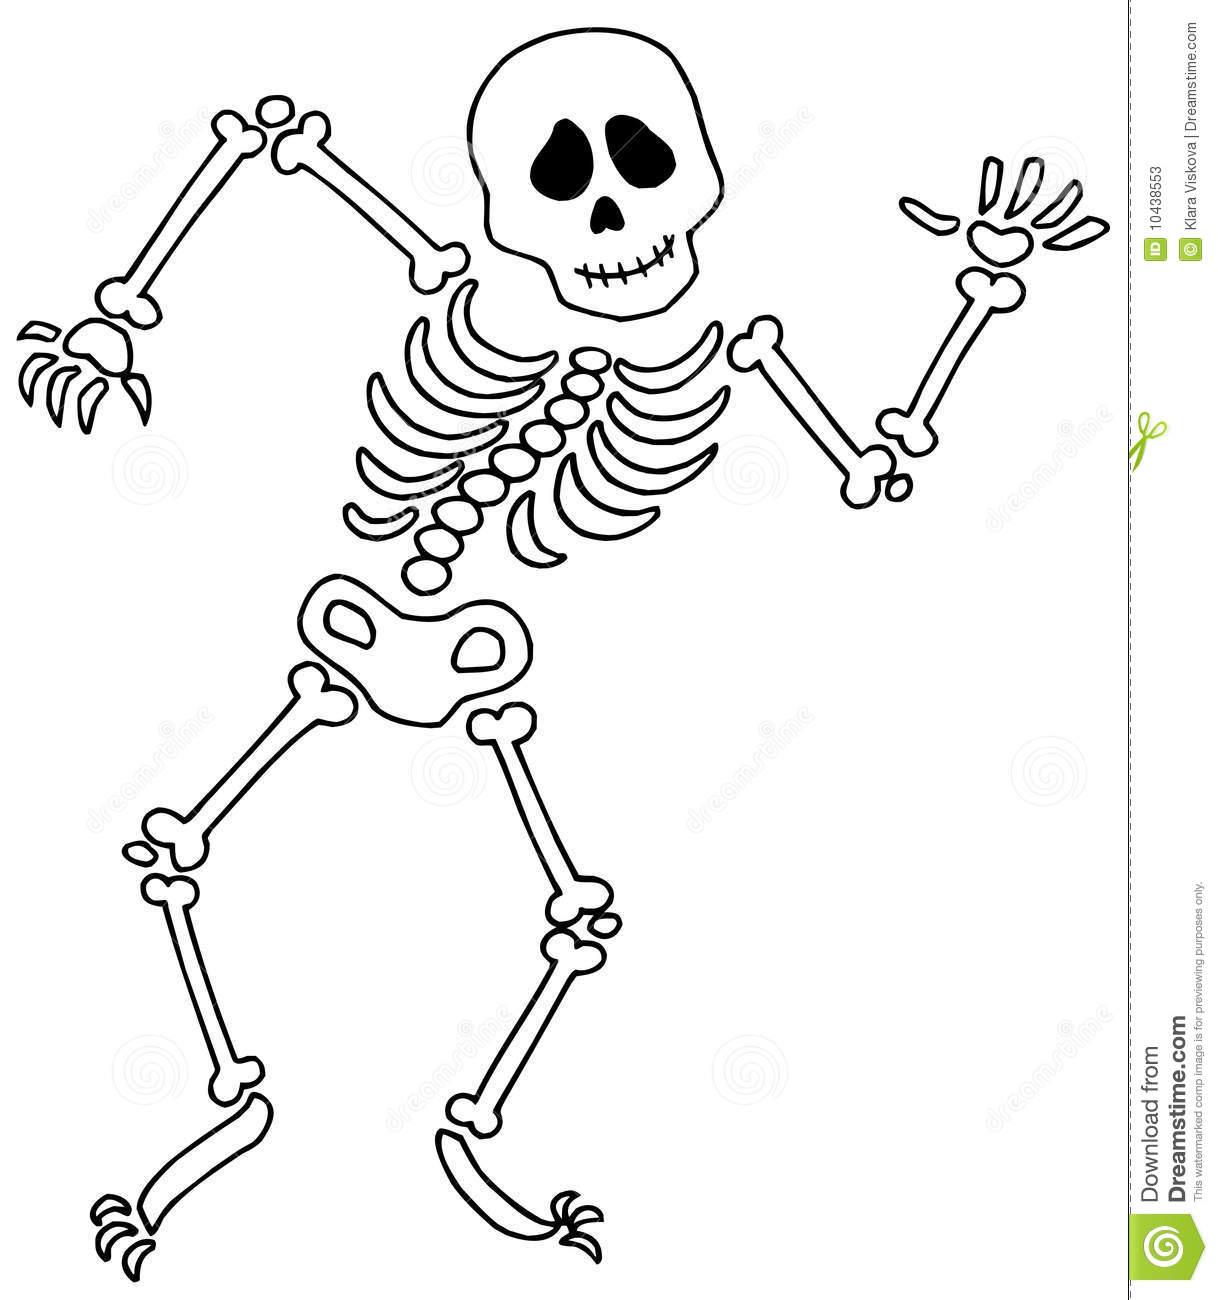 Skeleton clipart #20, Download drawings